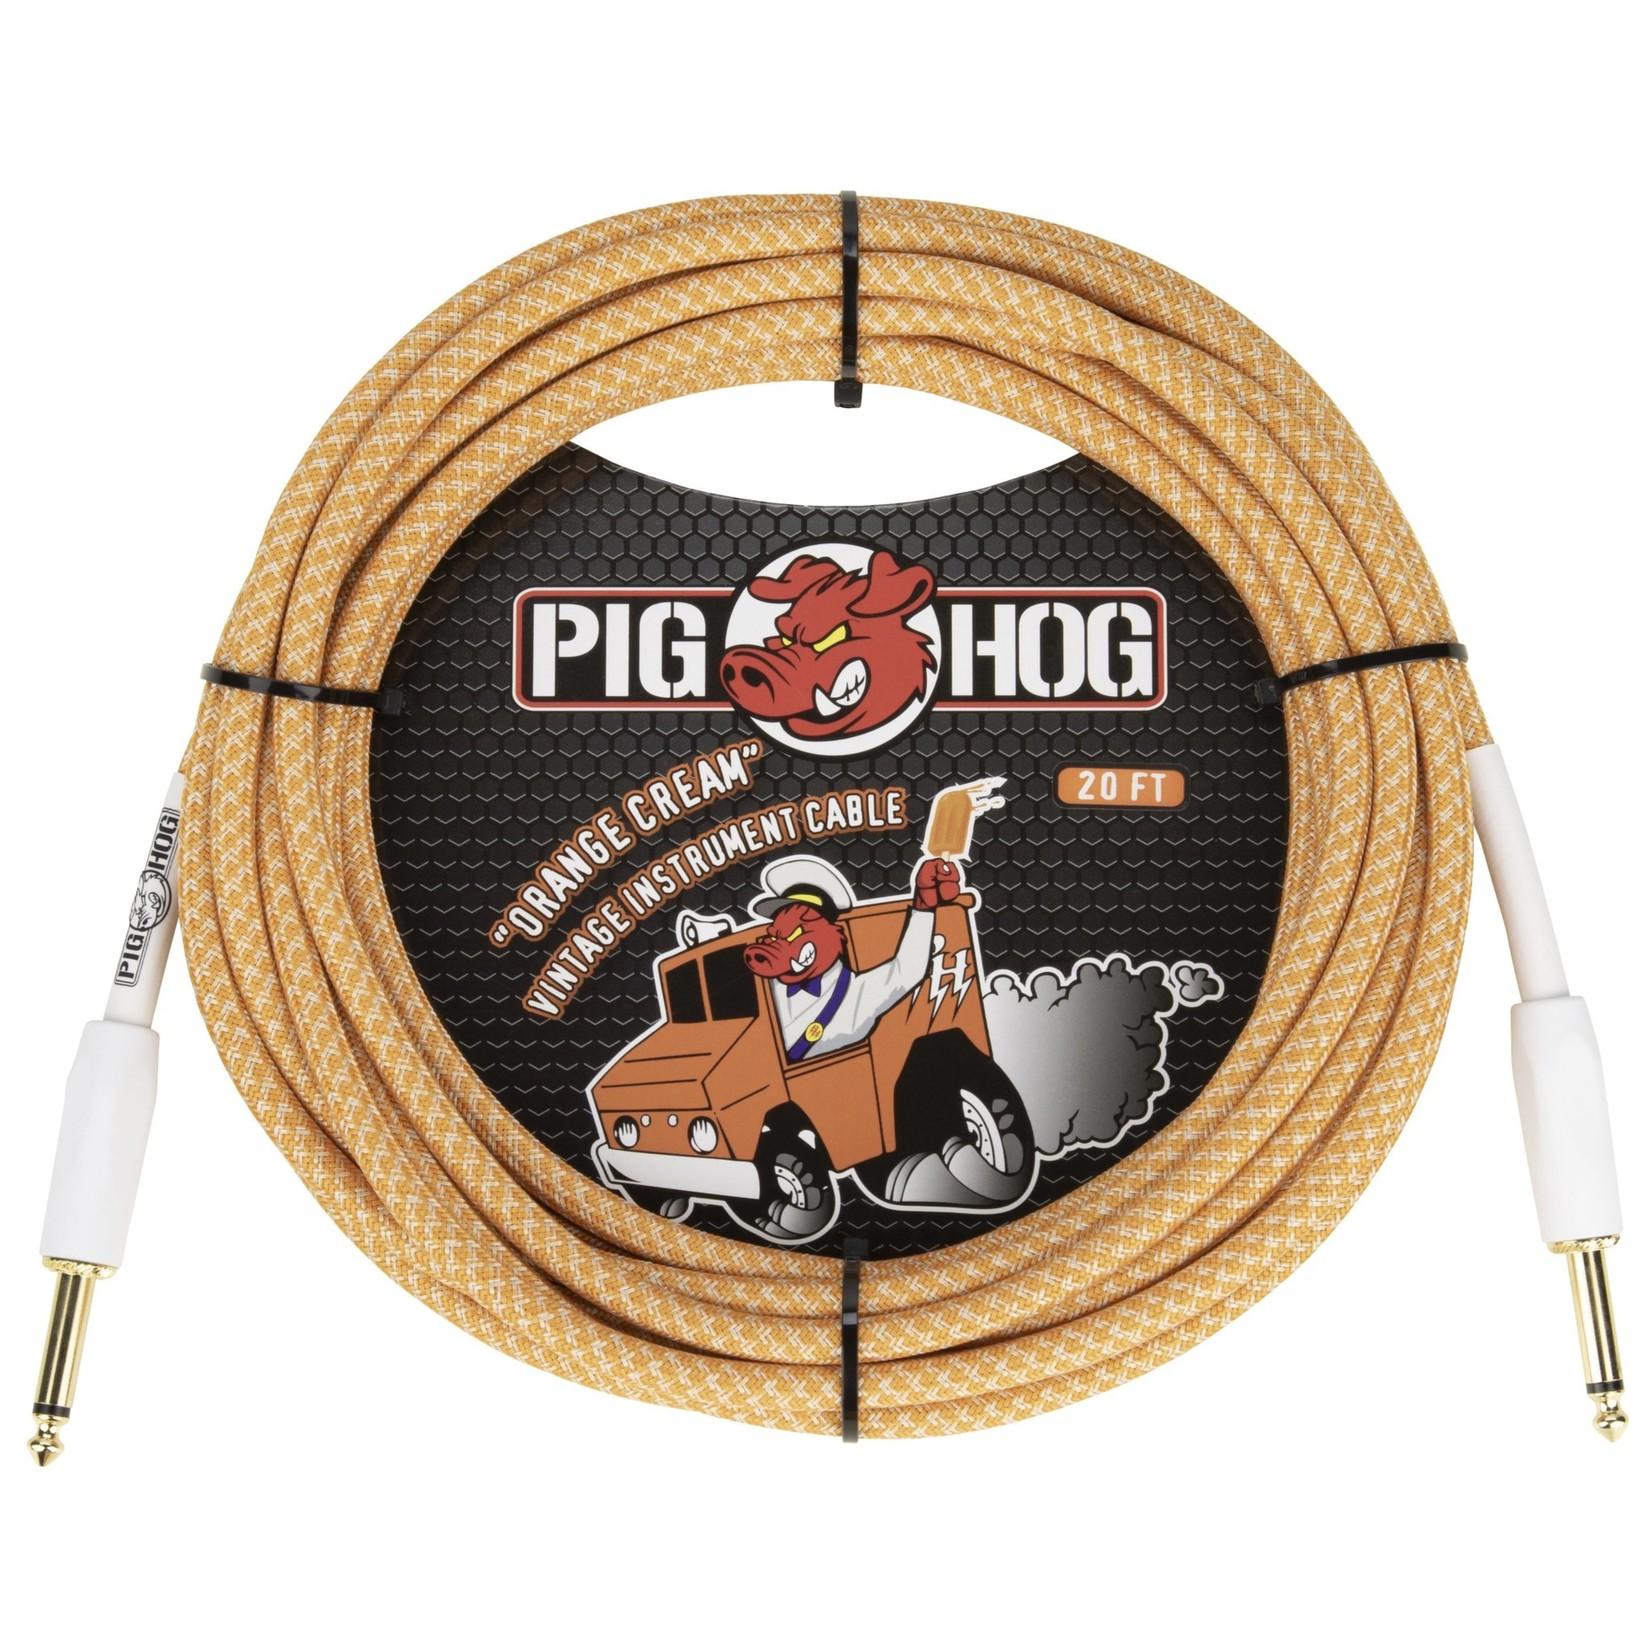 "Pig Hog Pig Hog Orange Cream v. 2.0 Tour Grade Vintage Woven Instrument Cable, 20ft, 1/4"" Straight TS (2020)"